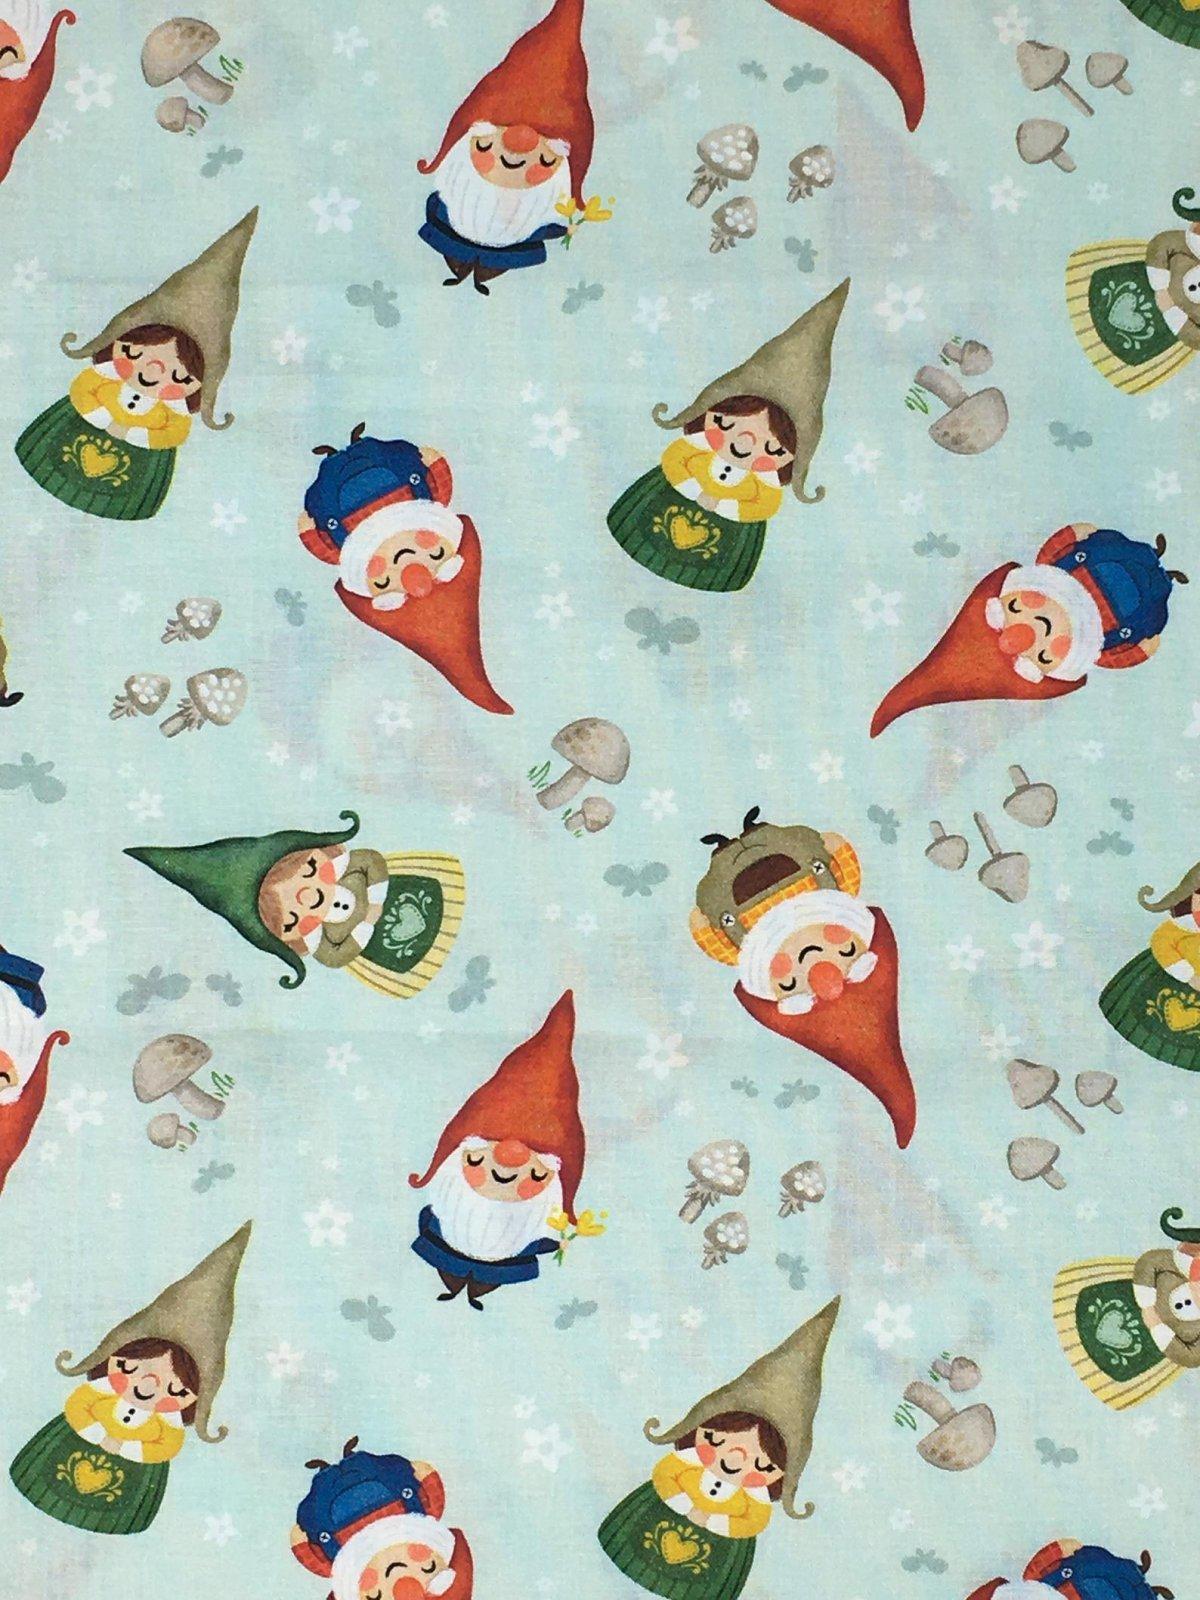 Gnome Sweet Gnome - Sweet Gnomes